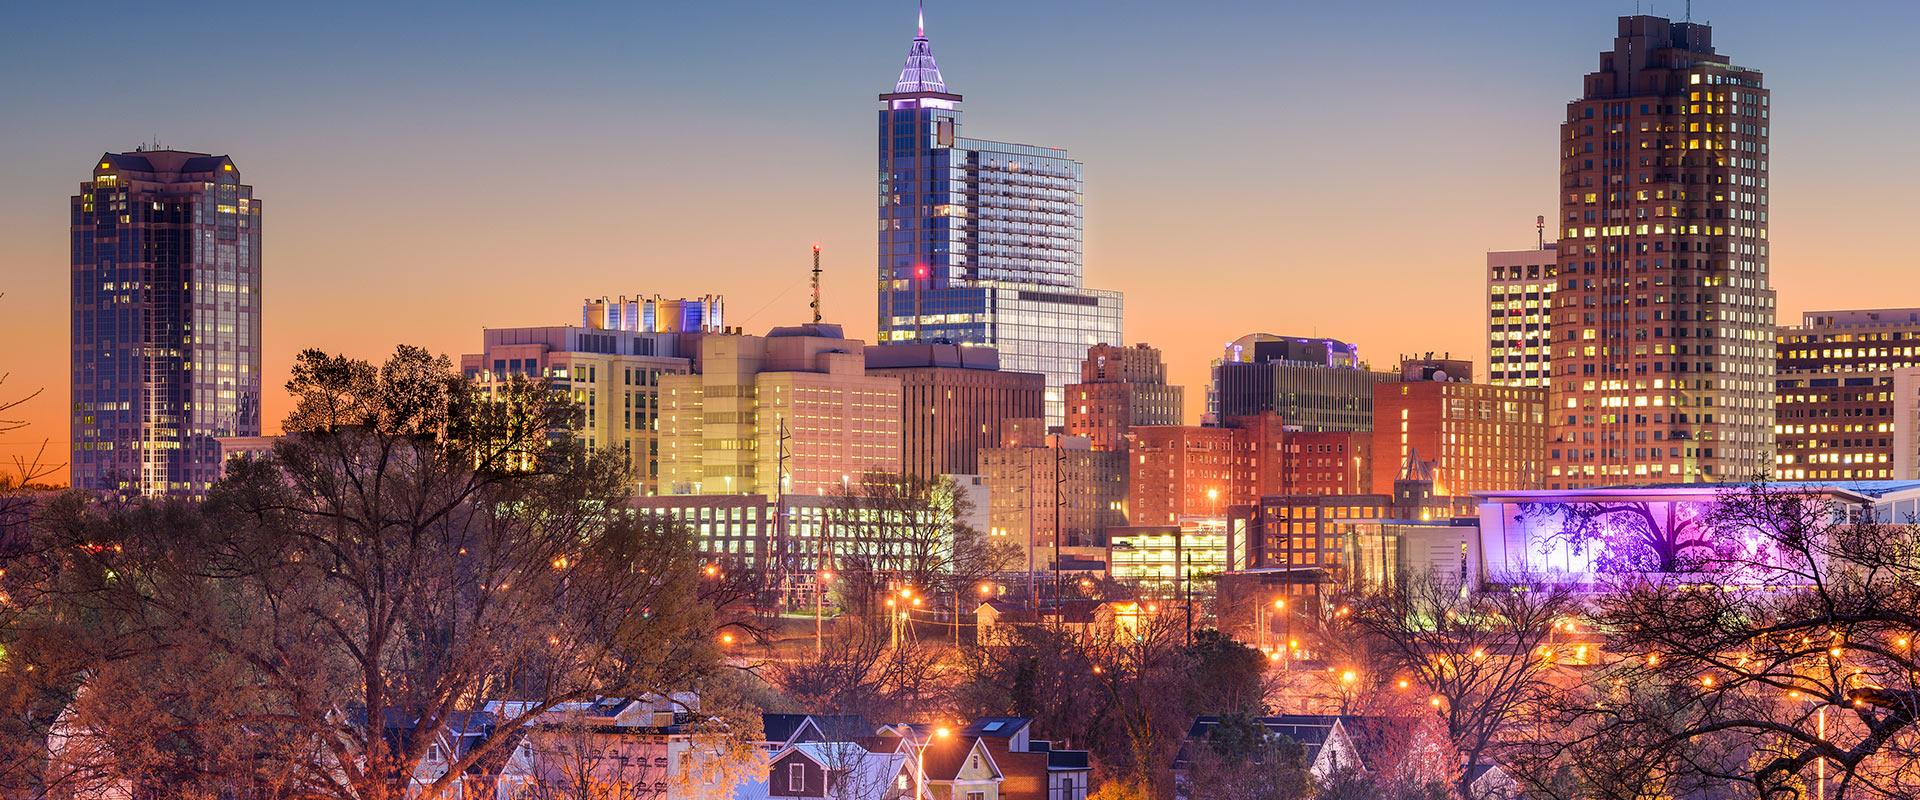 Raleigh-Durham North Carolina